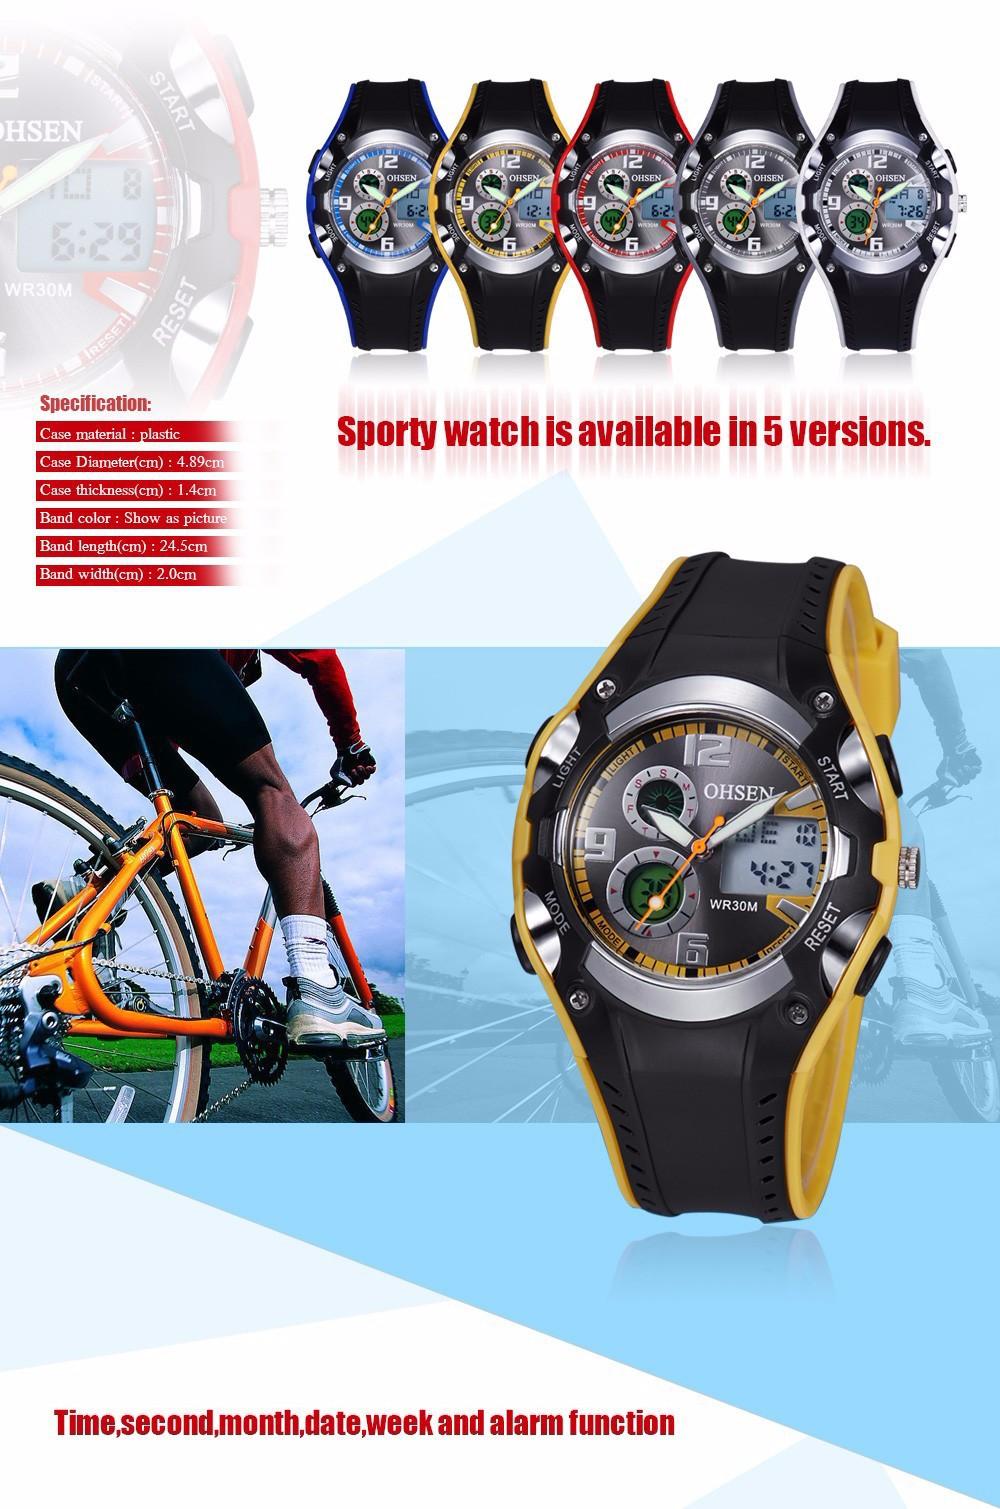 Original Ohsen Brand Fashion Sports Men's Watches 30M Waterproof Rubber Black Rubber Band Digital Sport Wristwatch for Men Gift (16)